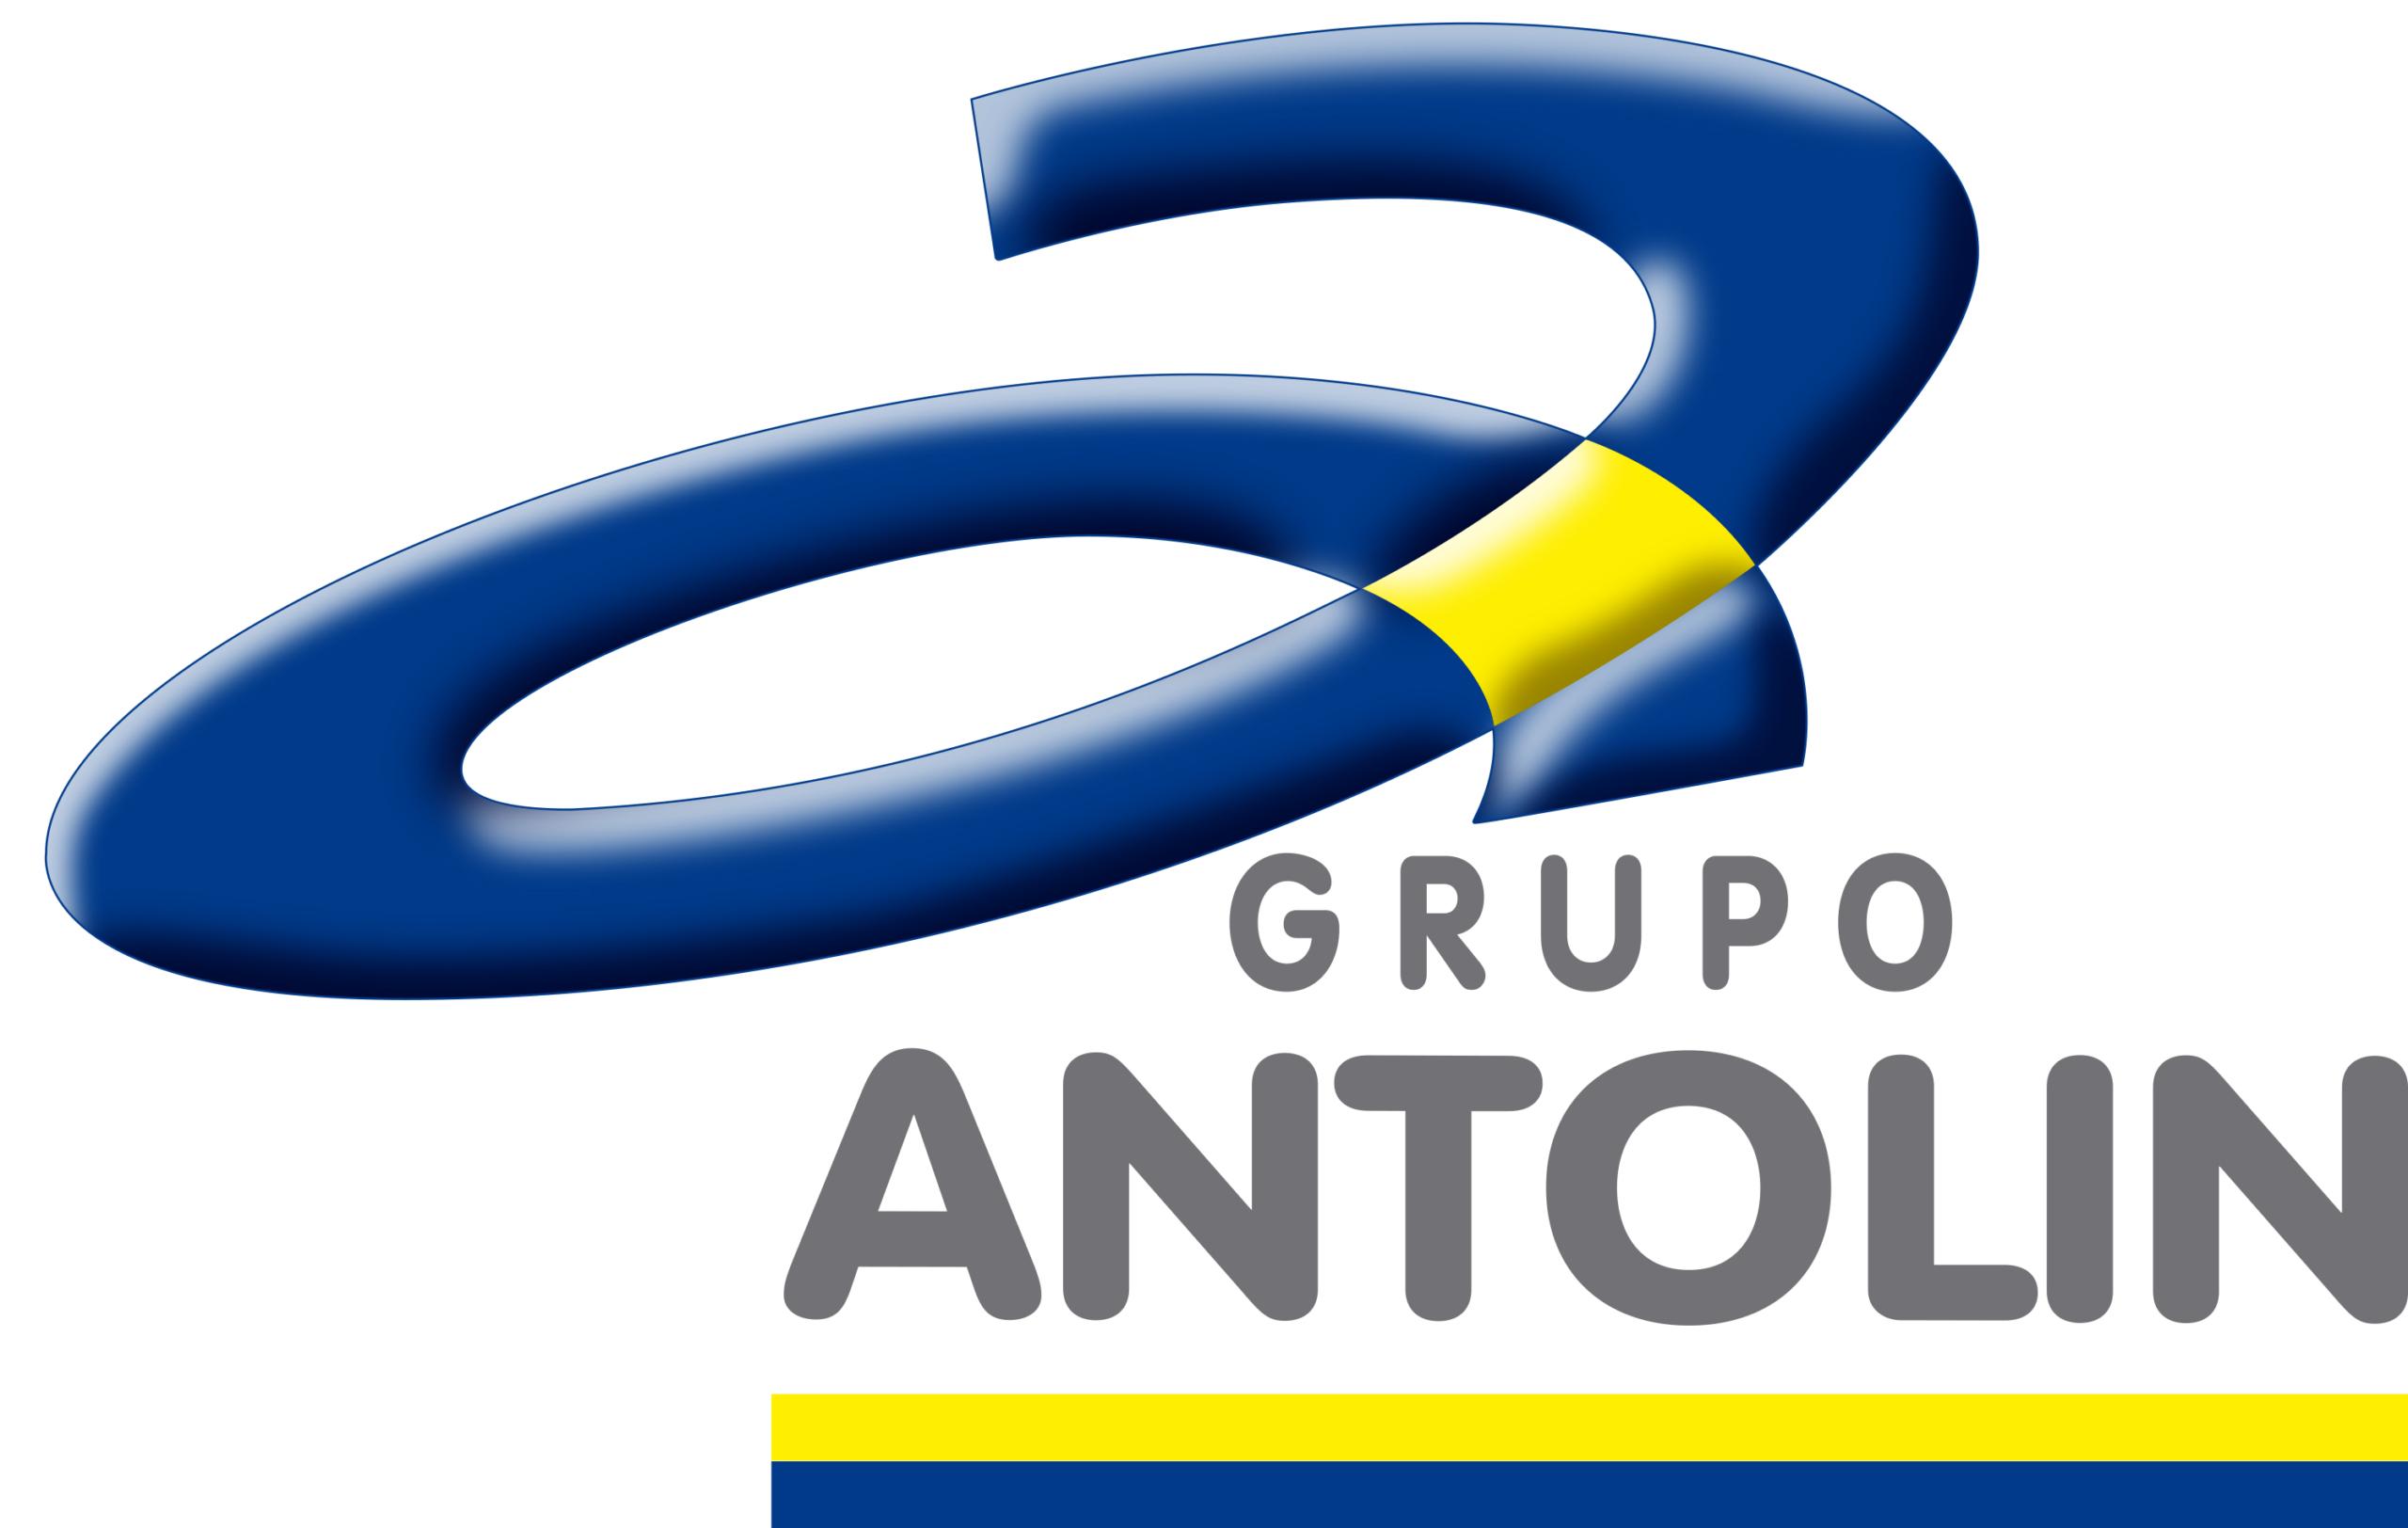 Grupo Antolin